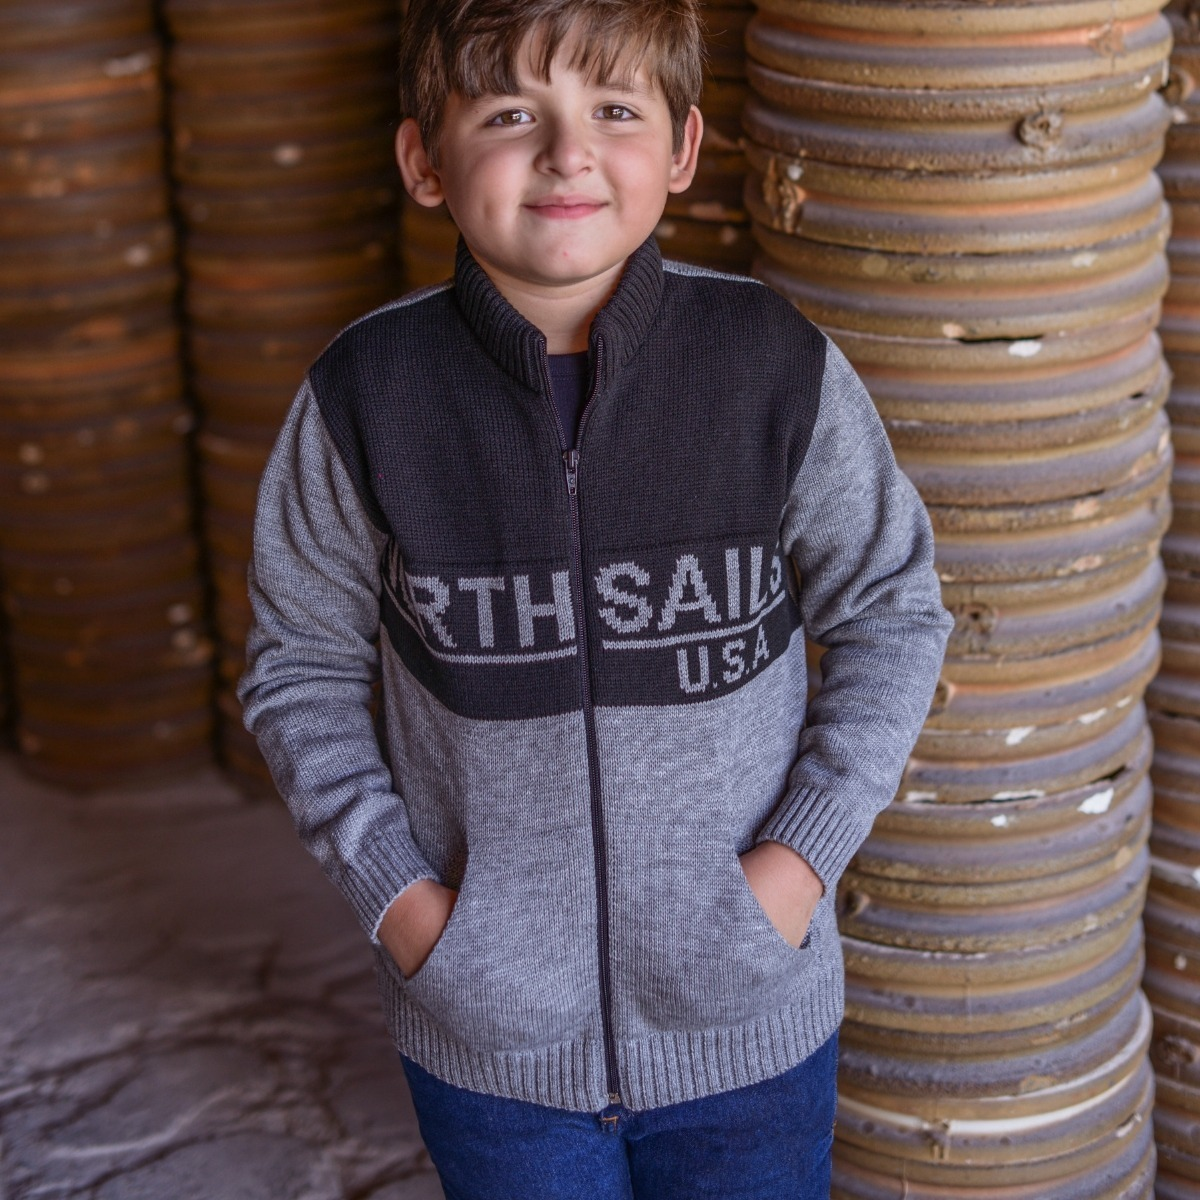 7bf0c2c9c3 casaco infantil inverno blusa quentinha de tricot menino. Carregando zoom.